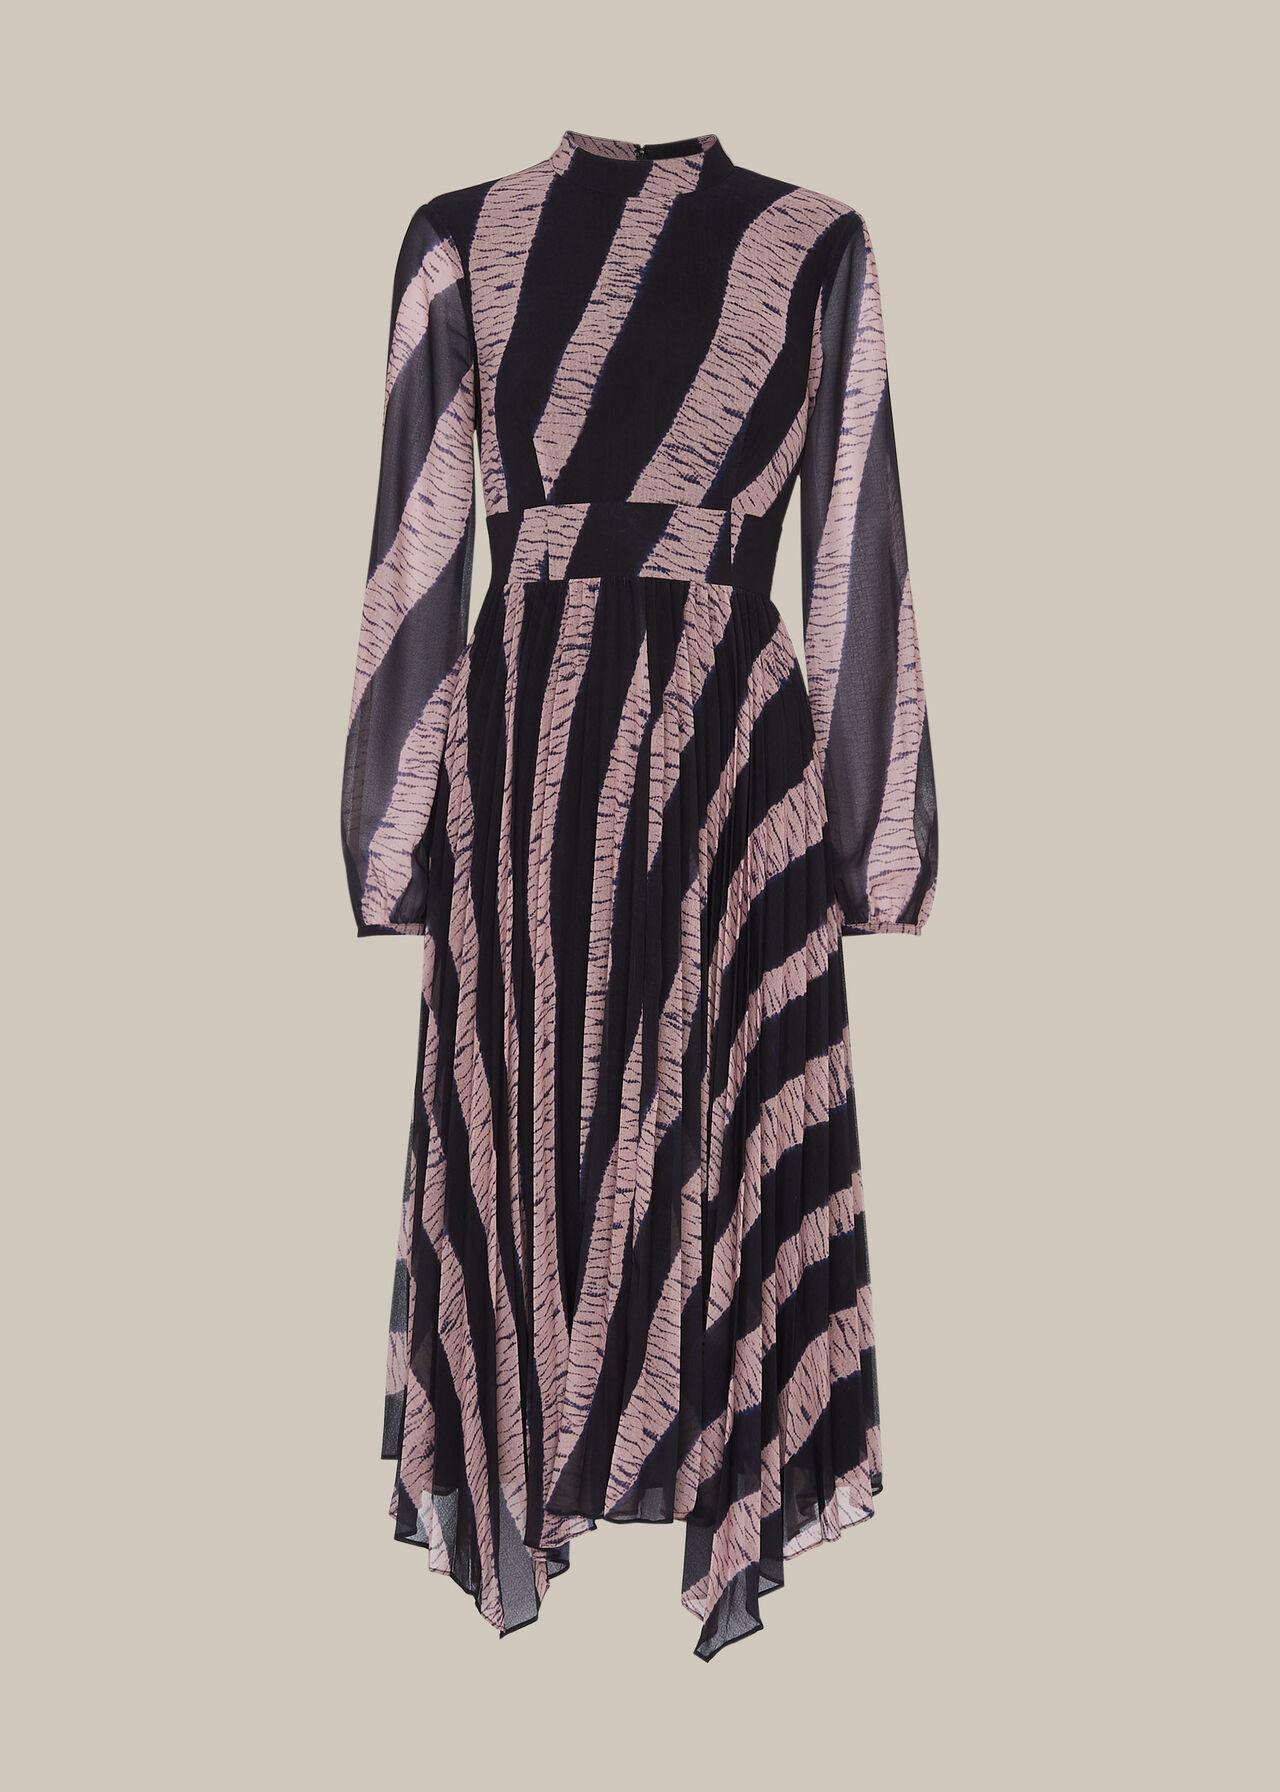 Shibori Print Pleated Dress